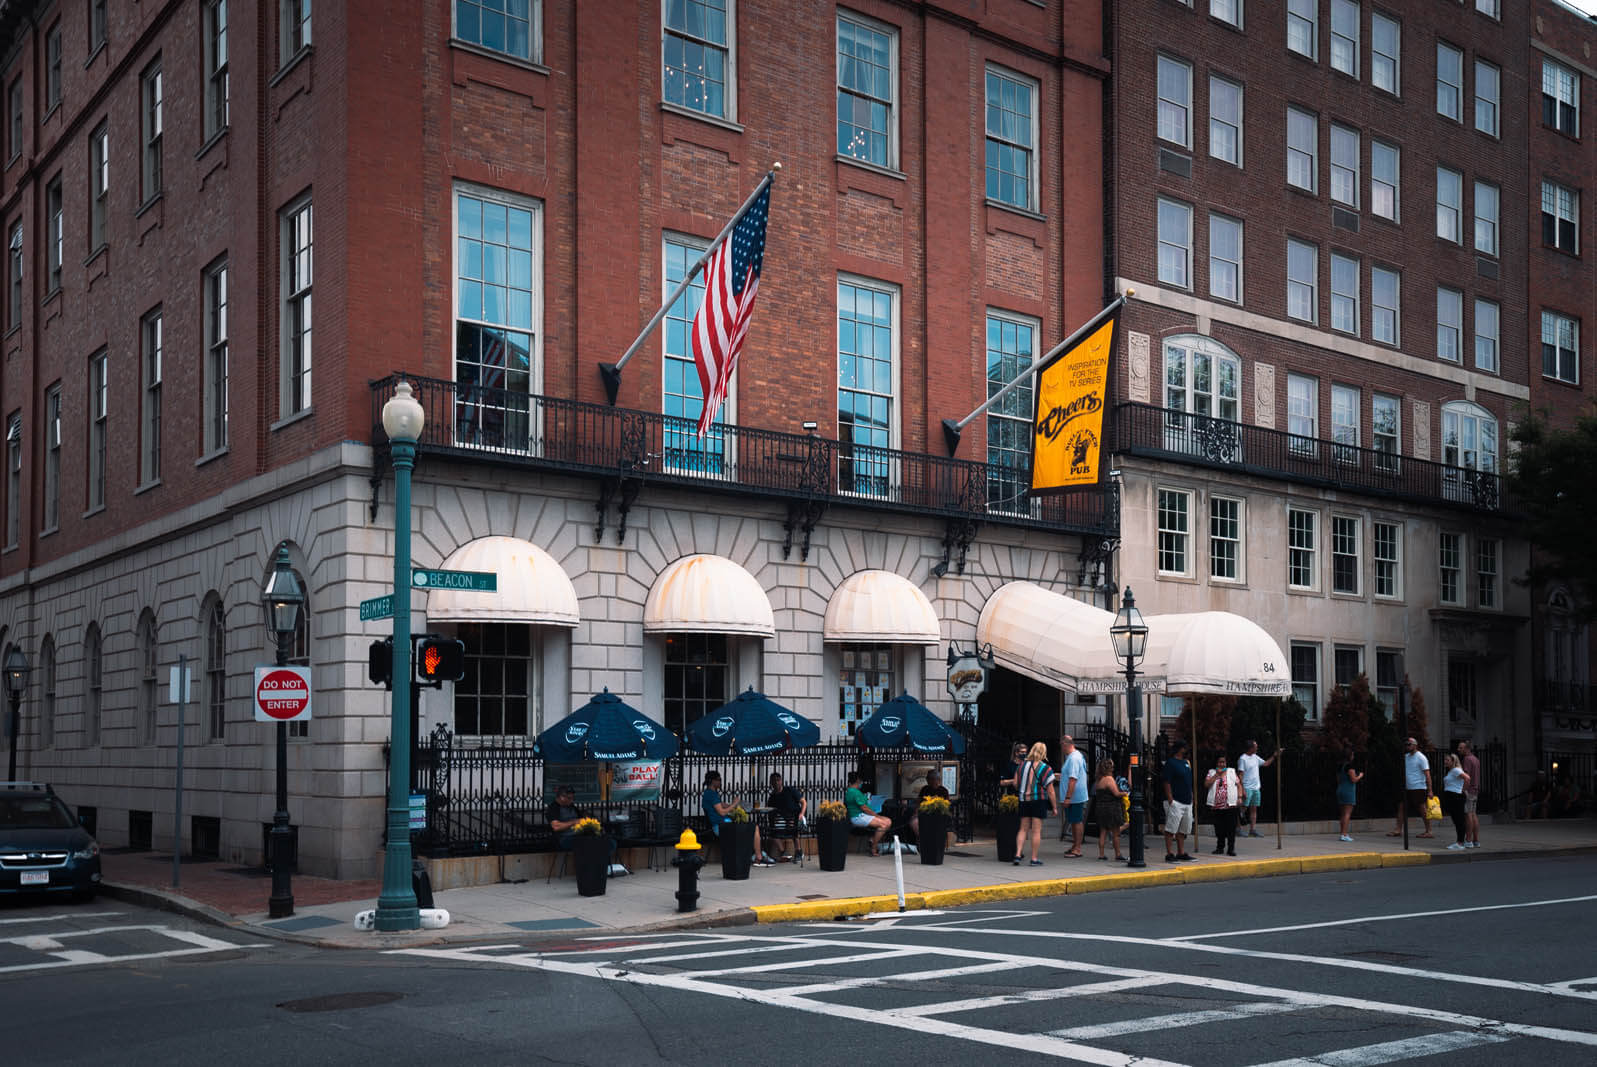 Cheers Bar in Boston next to Boston Common